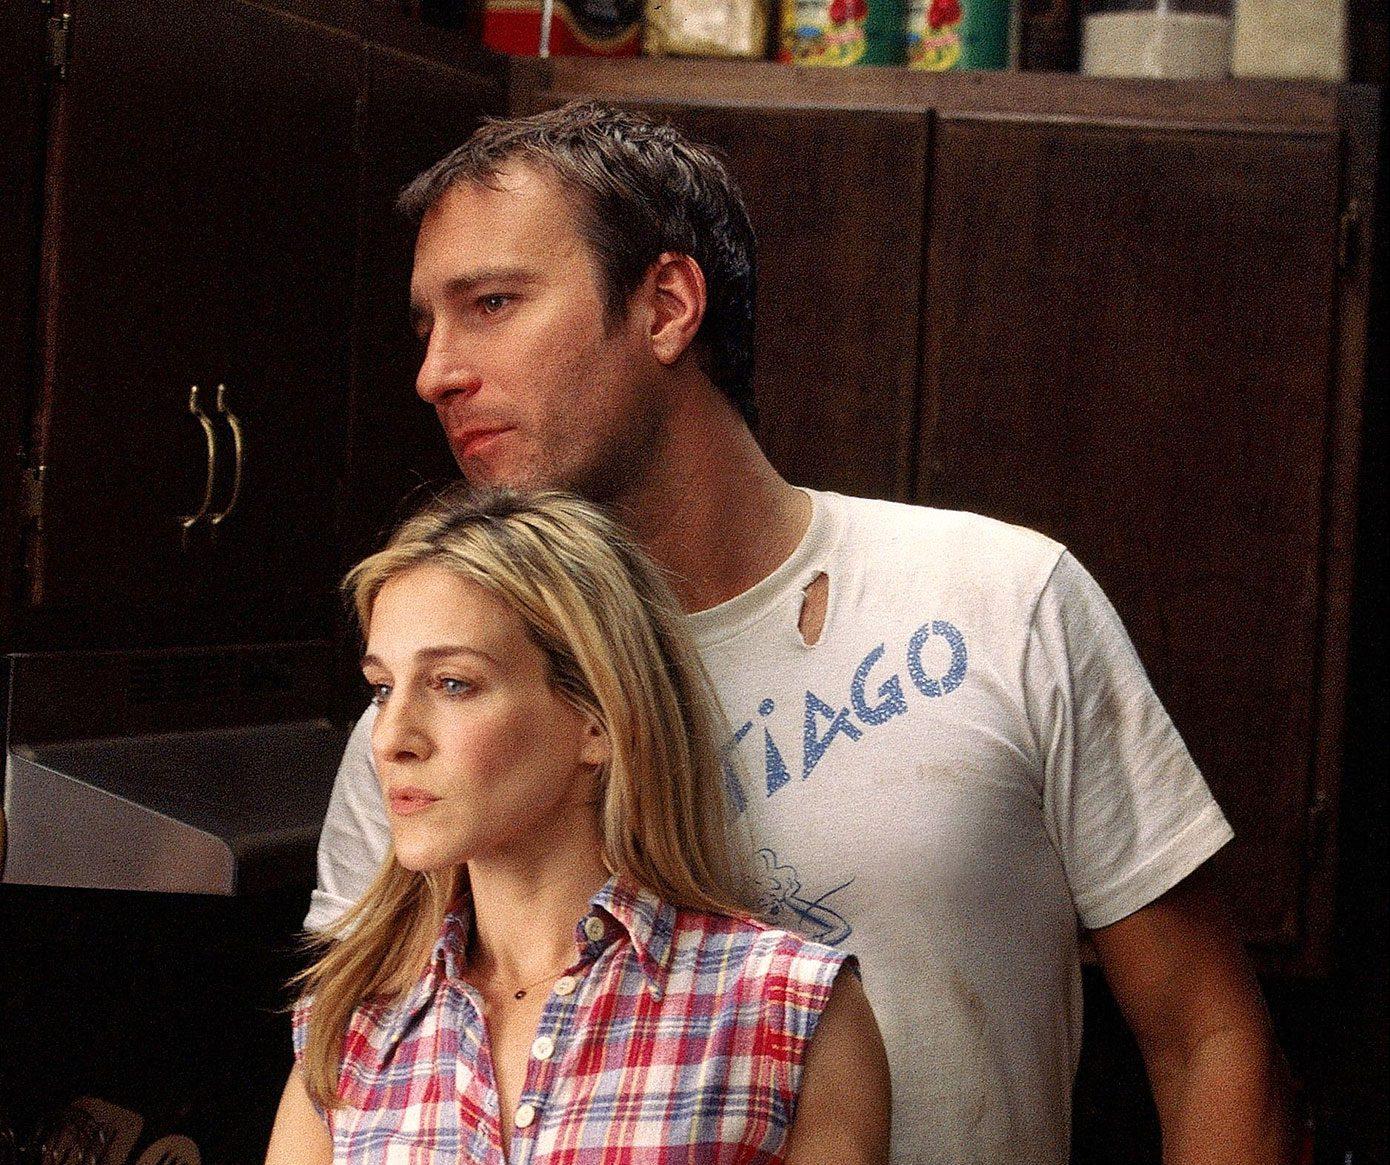 Carrie and Aidan